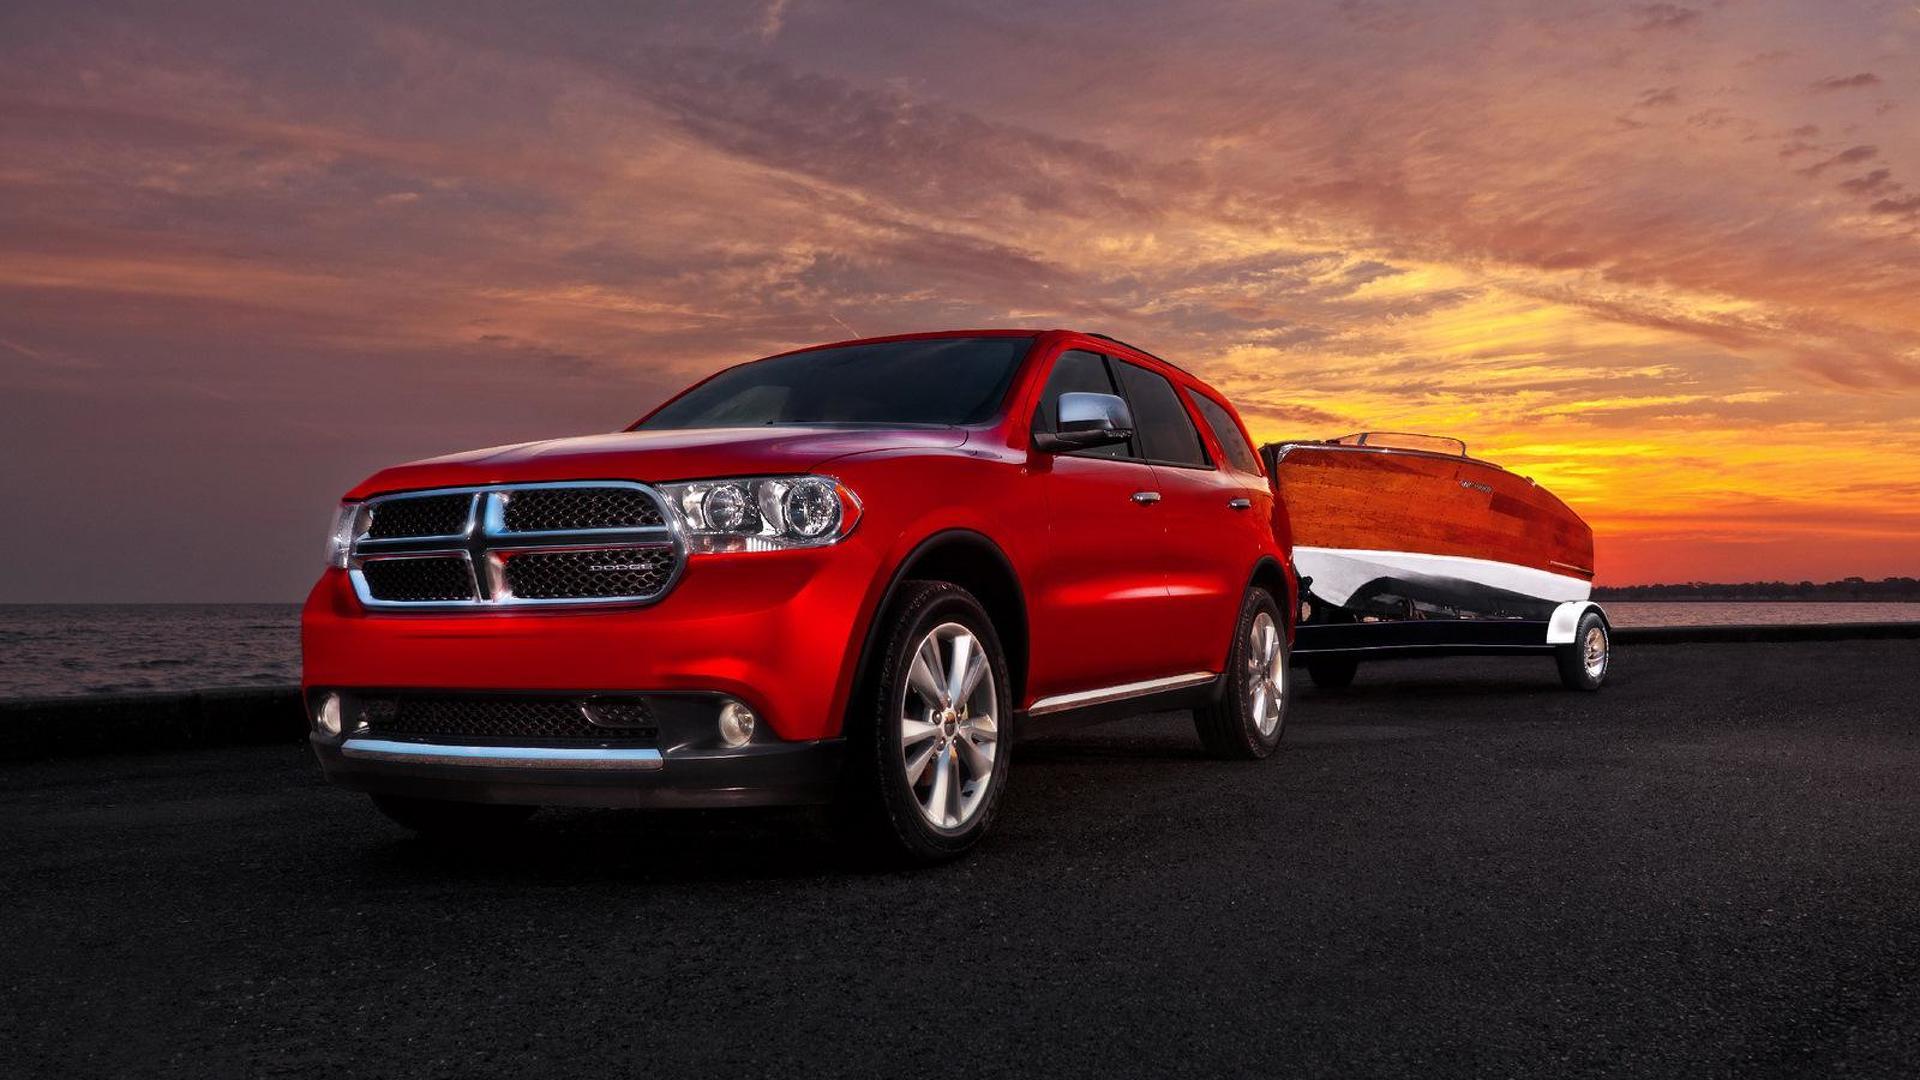 2011 Dodge Durango: In Depth